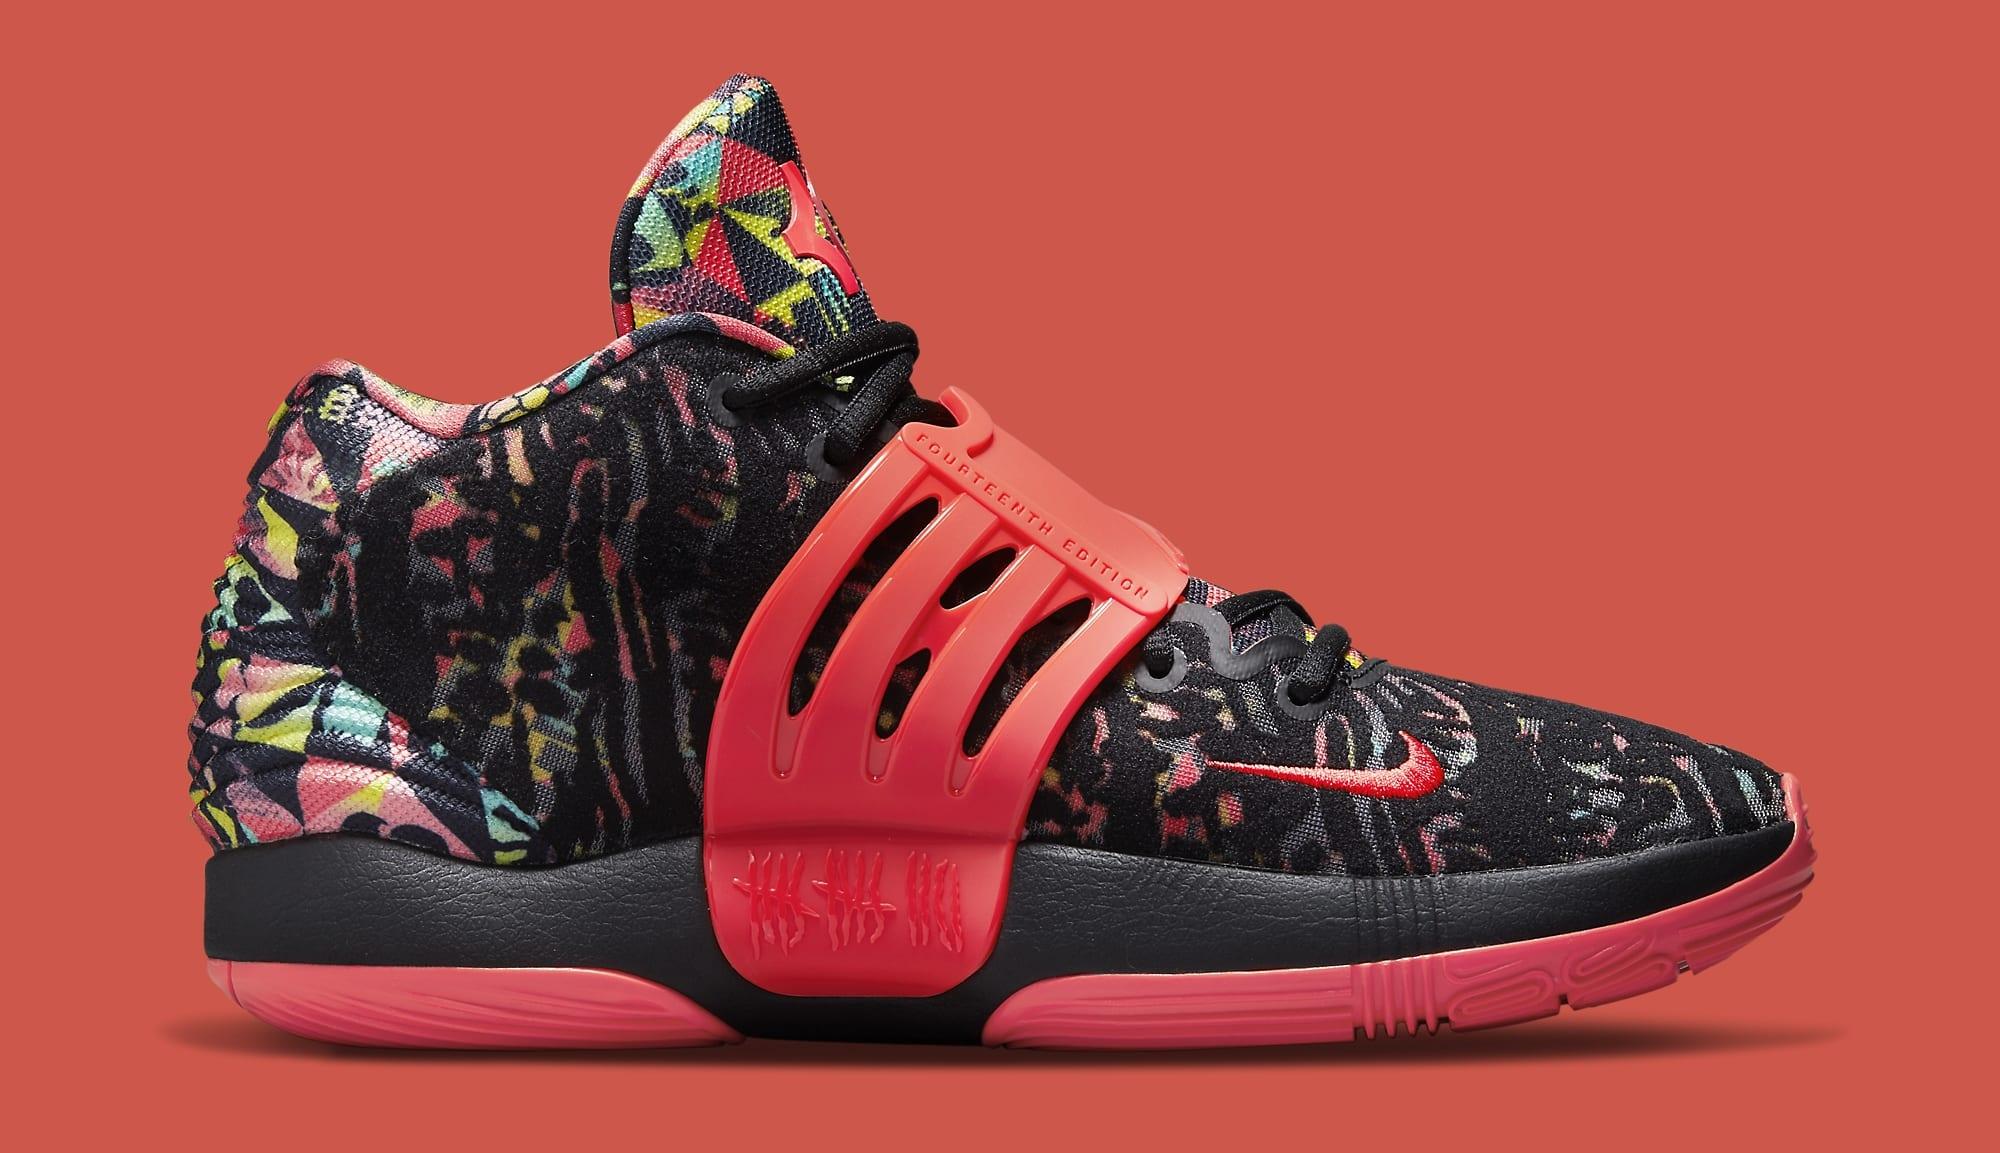 Nike KD 14 'Ky-D' CW3935-002 Medial